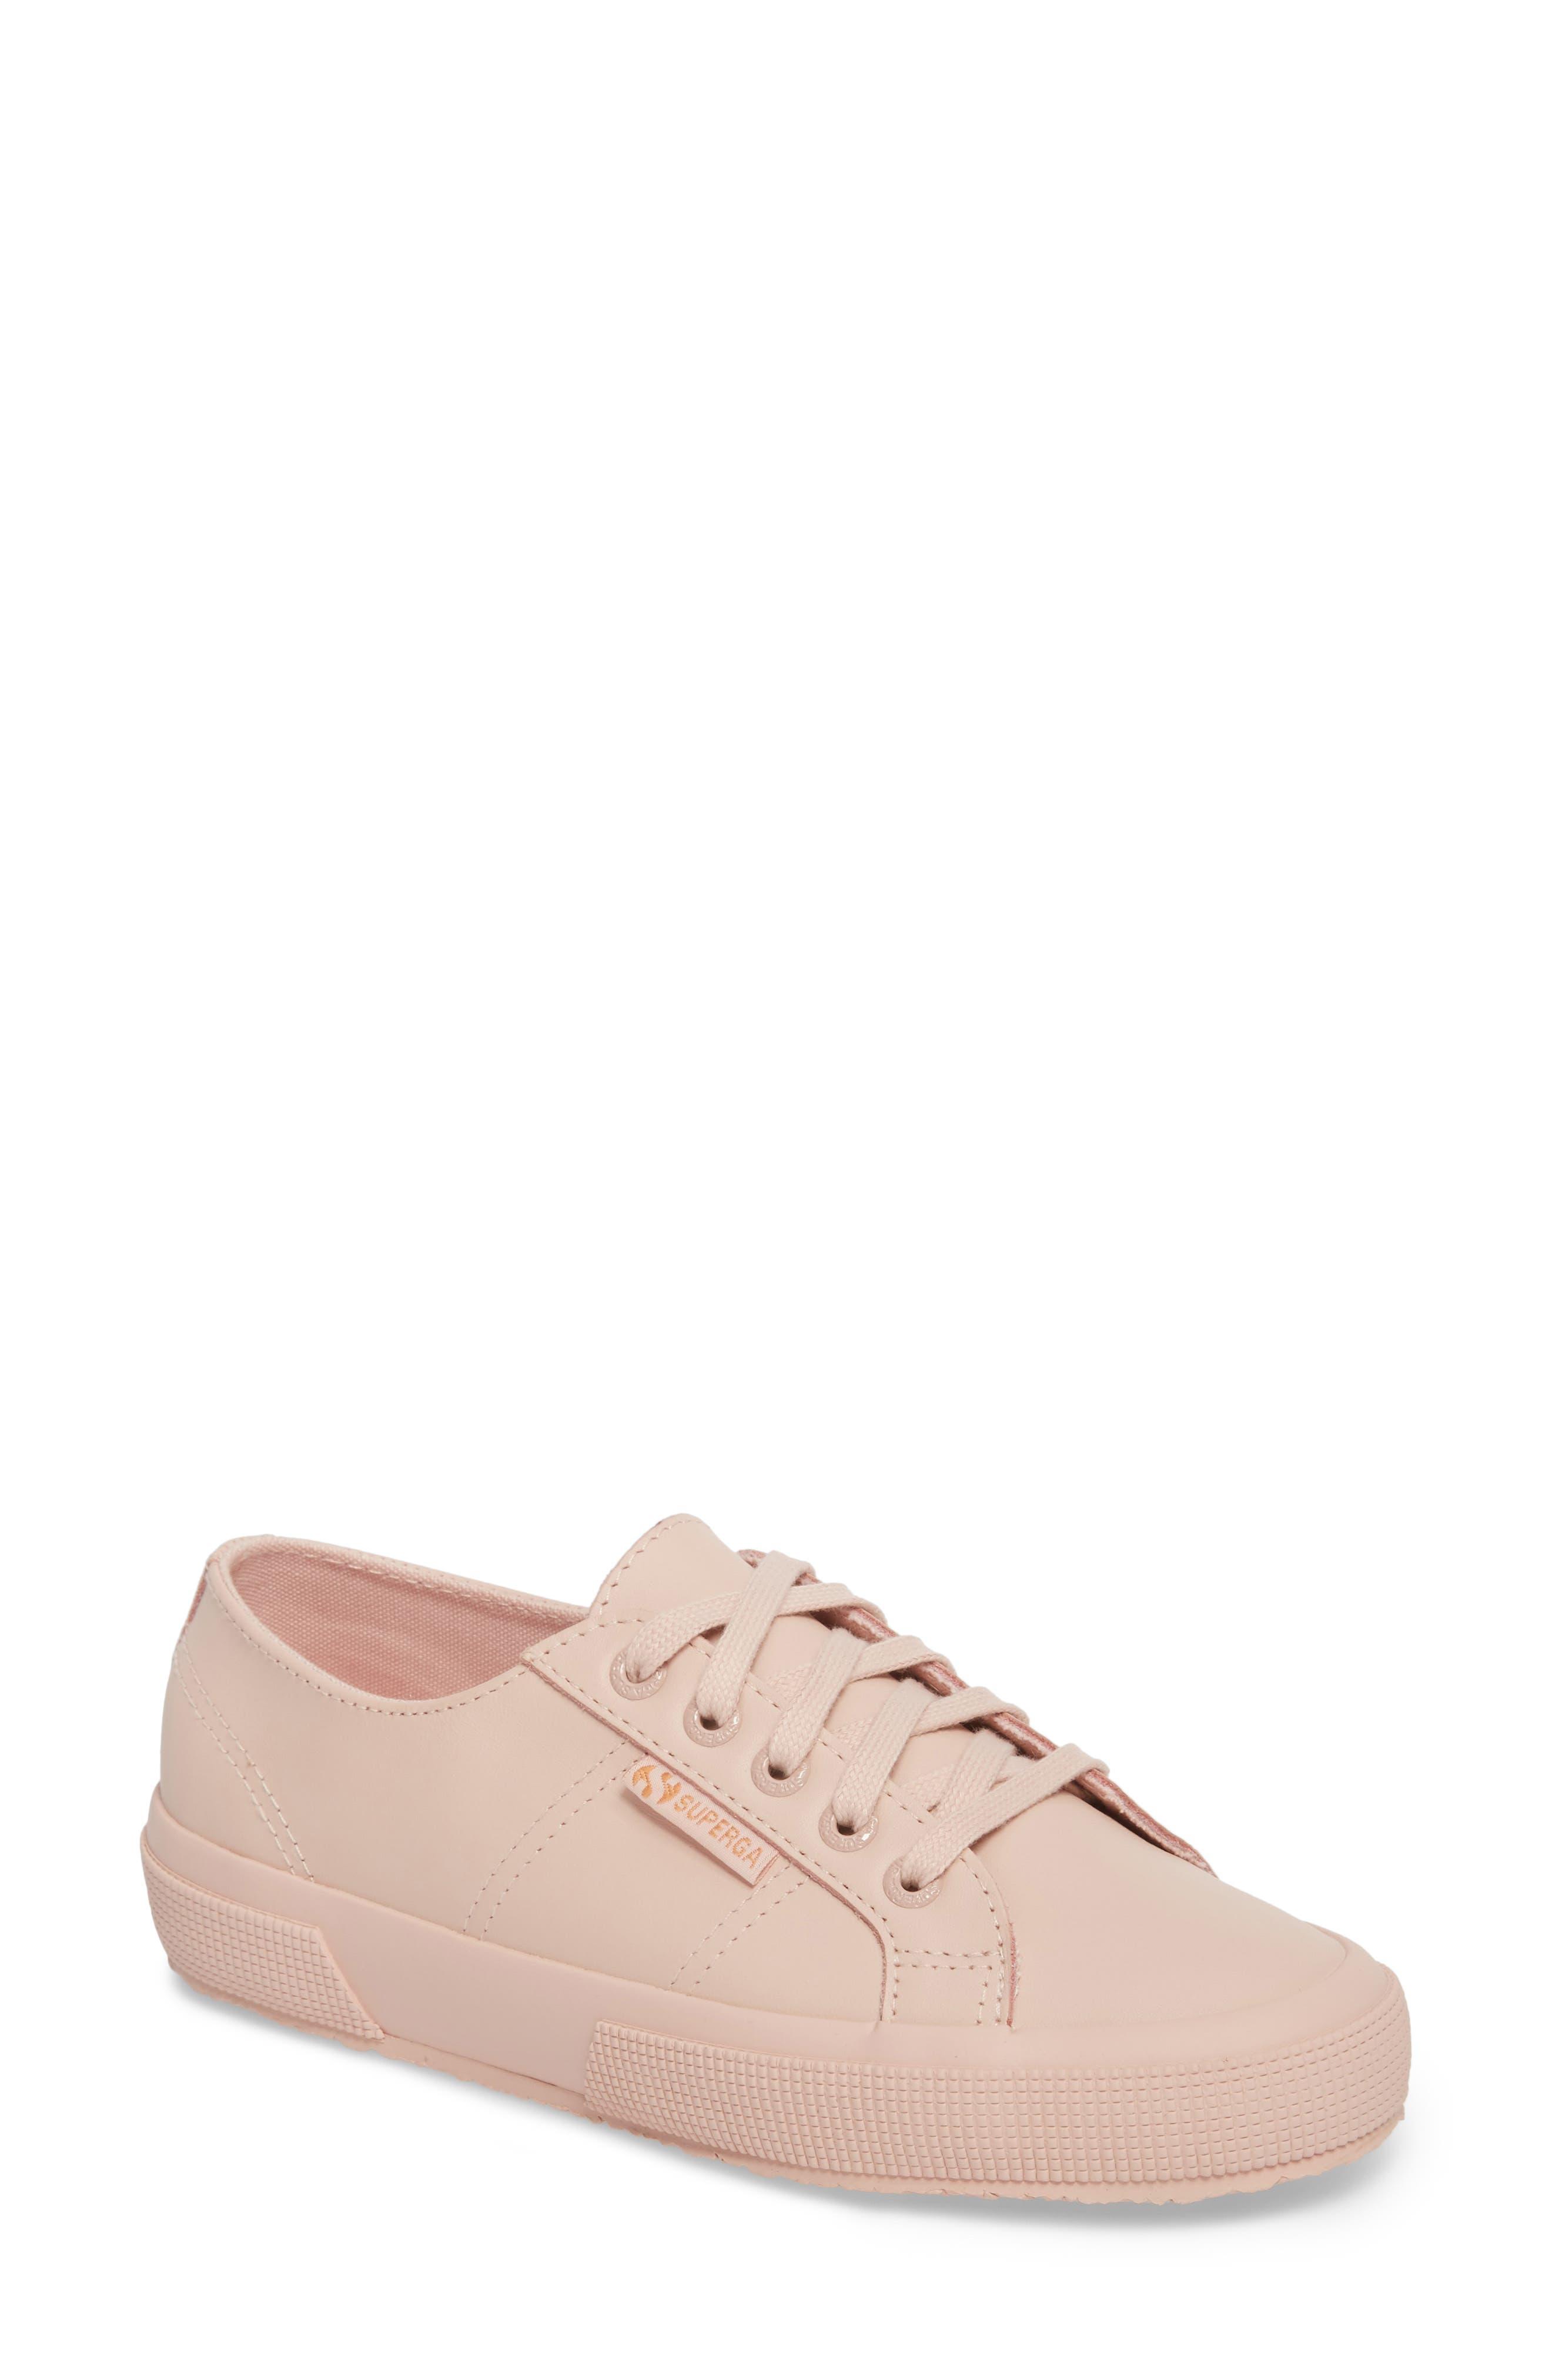 Main Image - Superga '2750' Sneaker (Women)